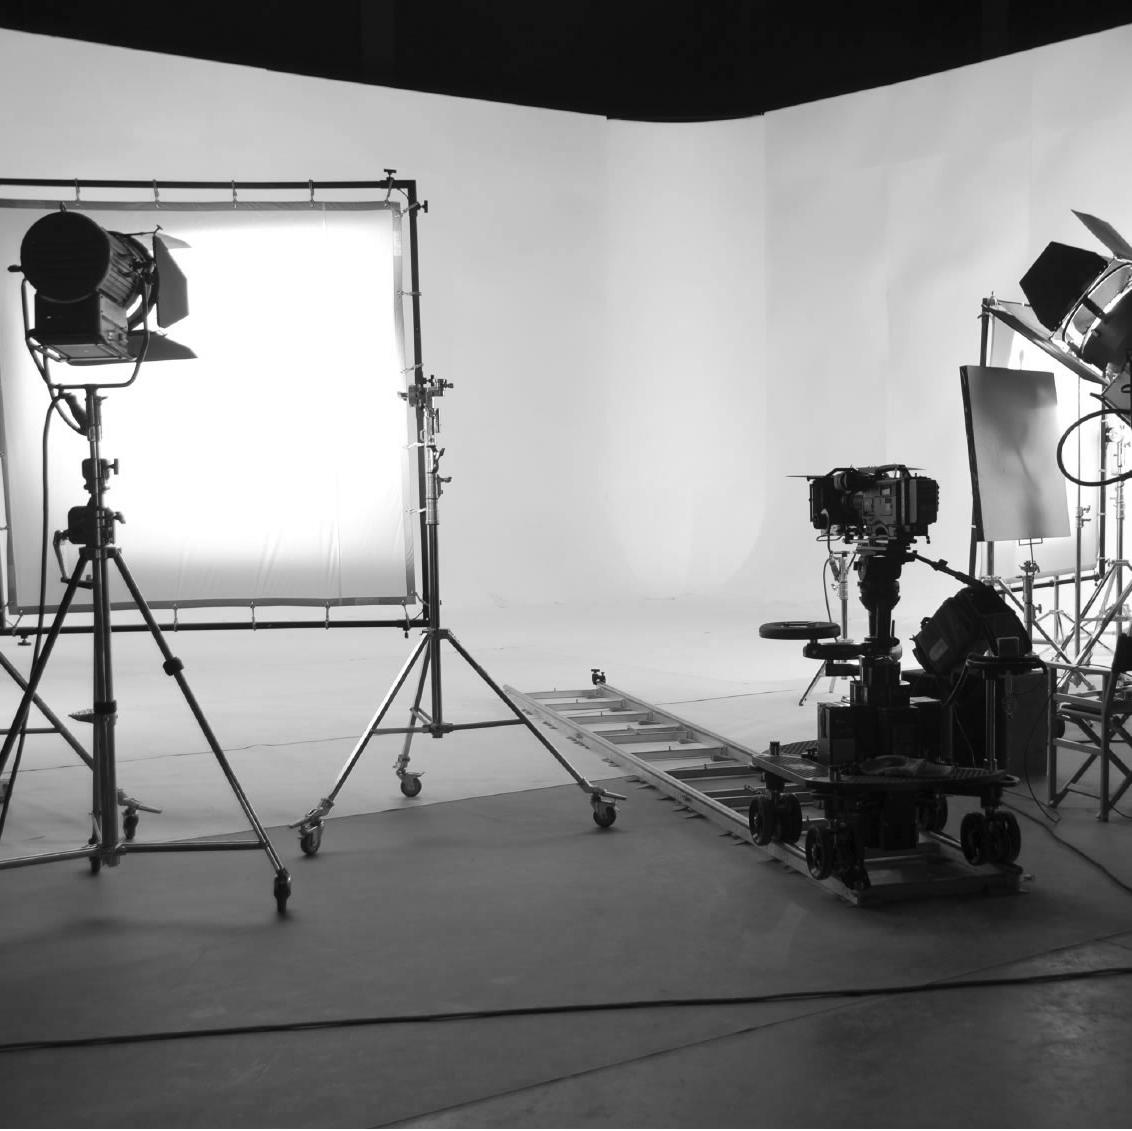 focus-studio-shot-pic.jpg